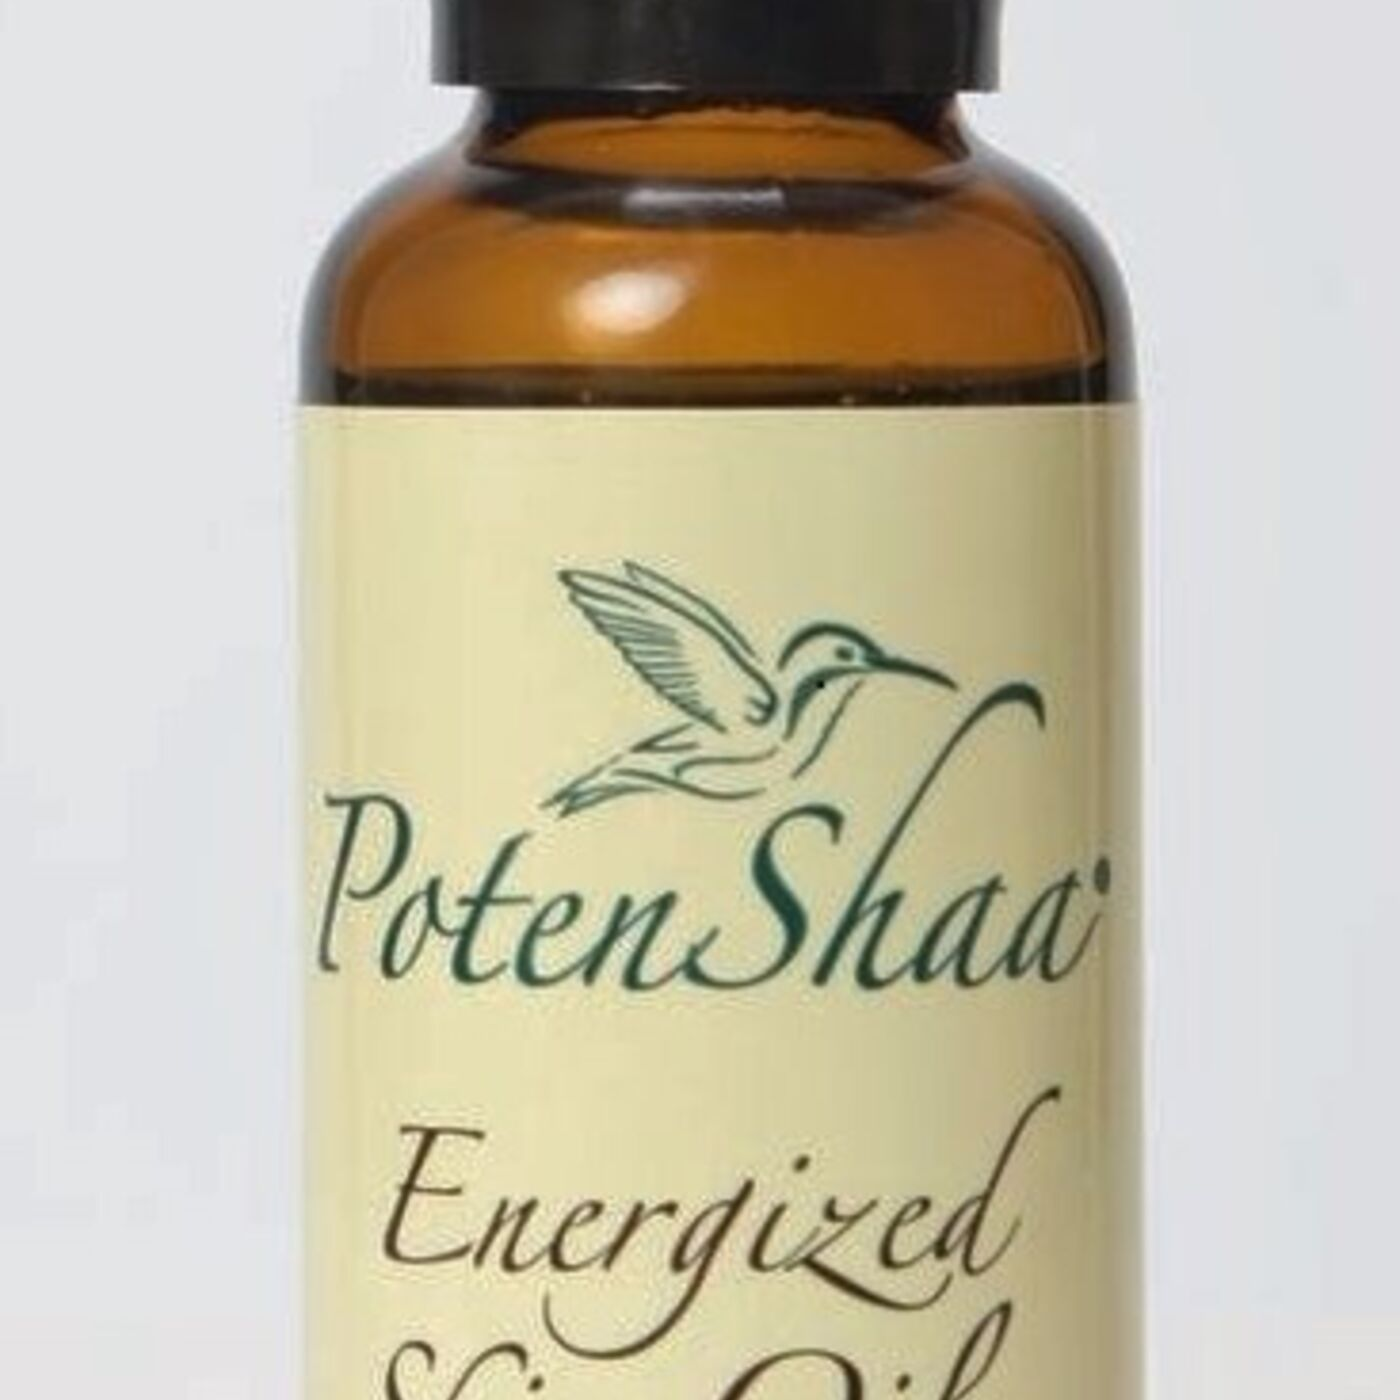 POTENSHAA and Skin Protection